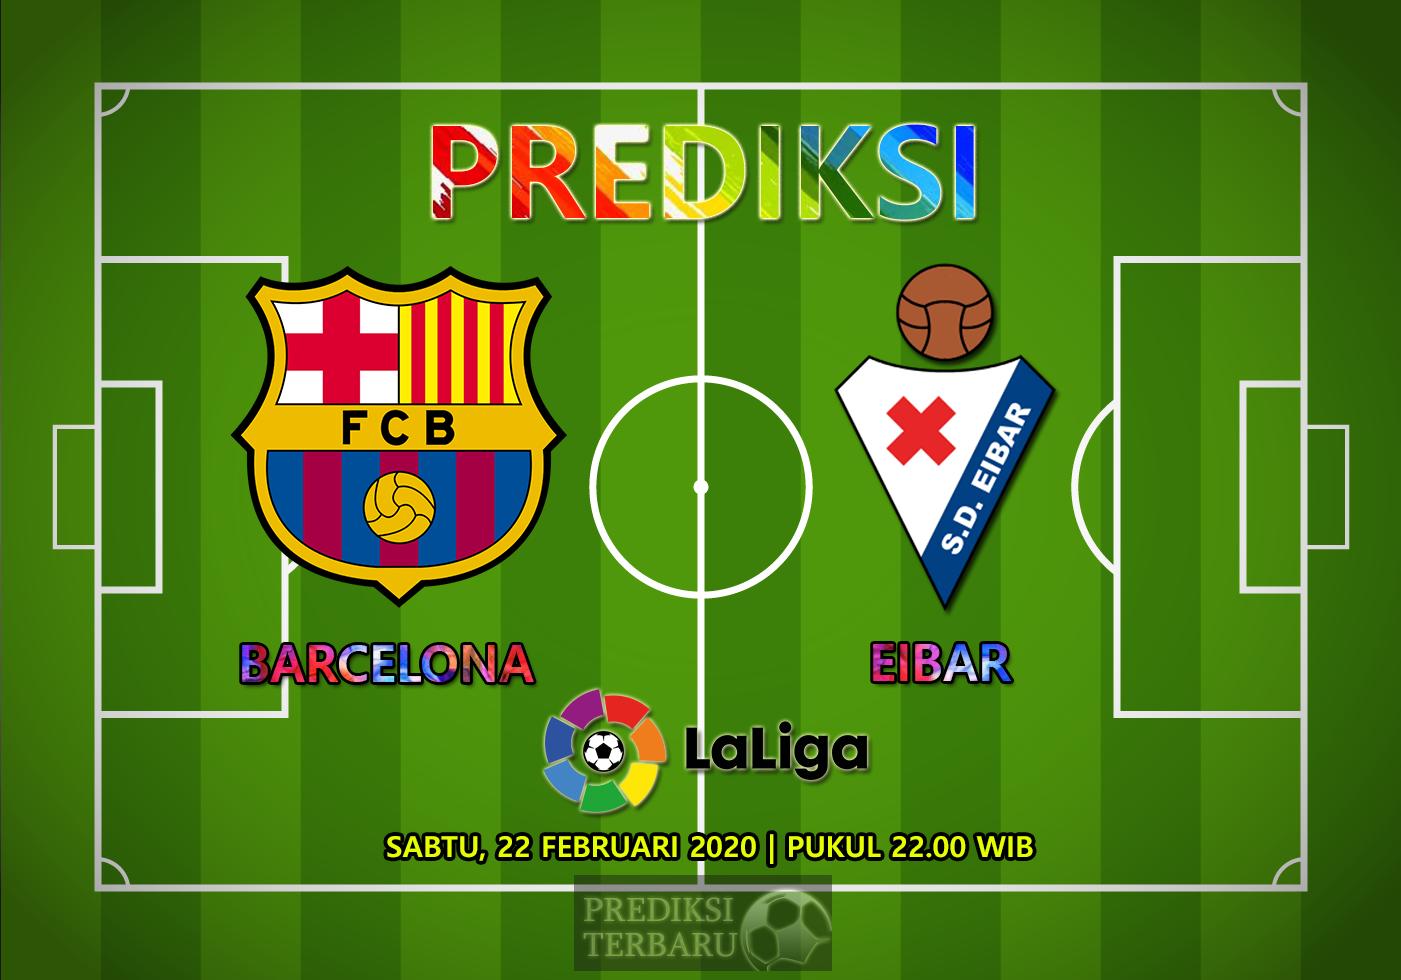 Prediksi Barcelona Vs Eibar, Sabtu 22 Februari